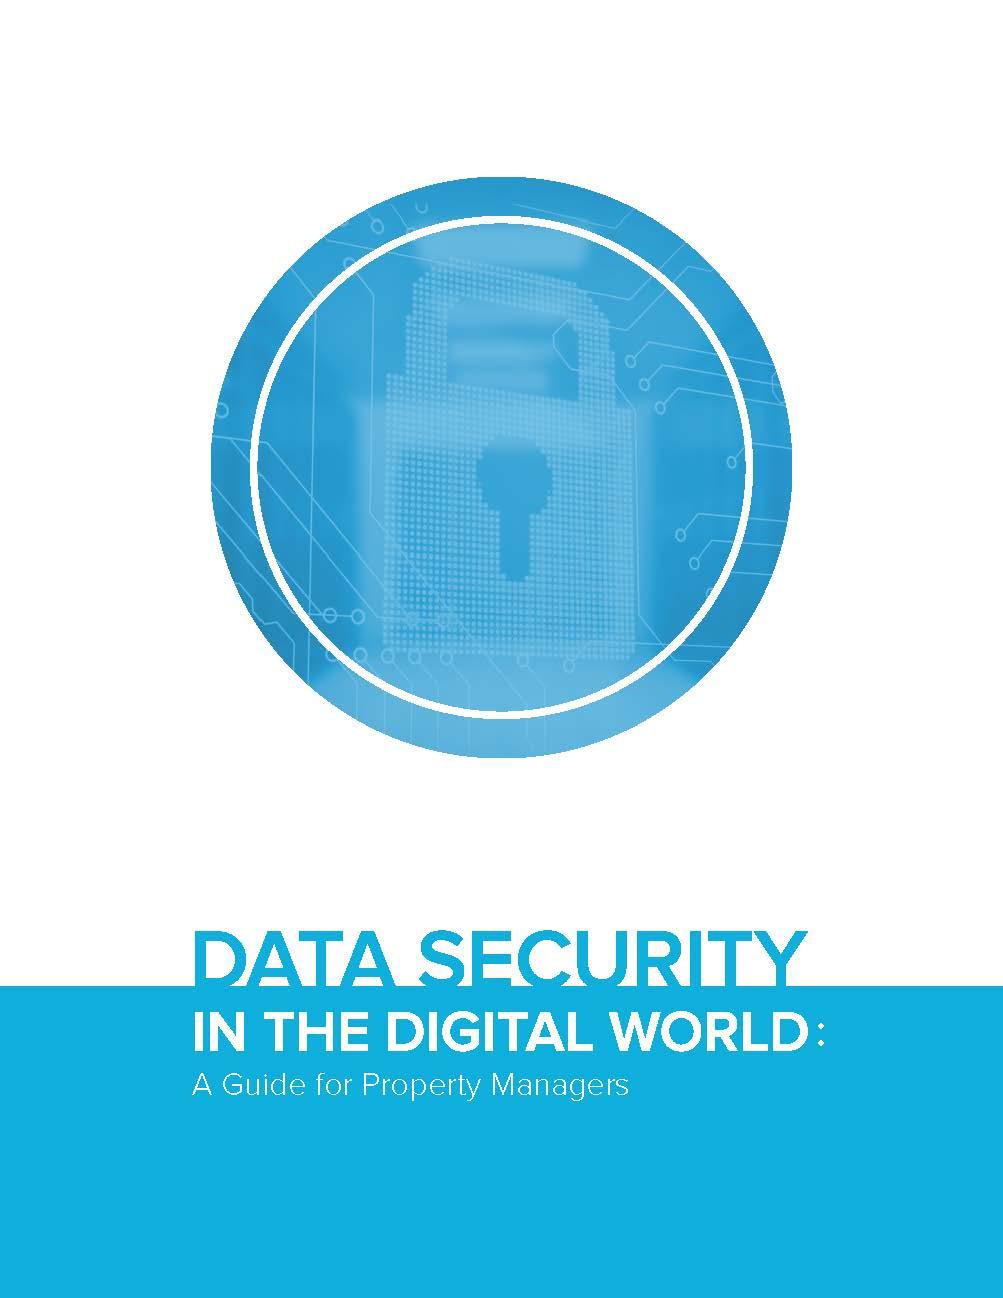 Data security in a digital world